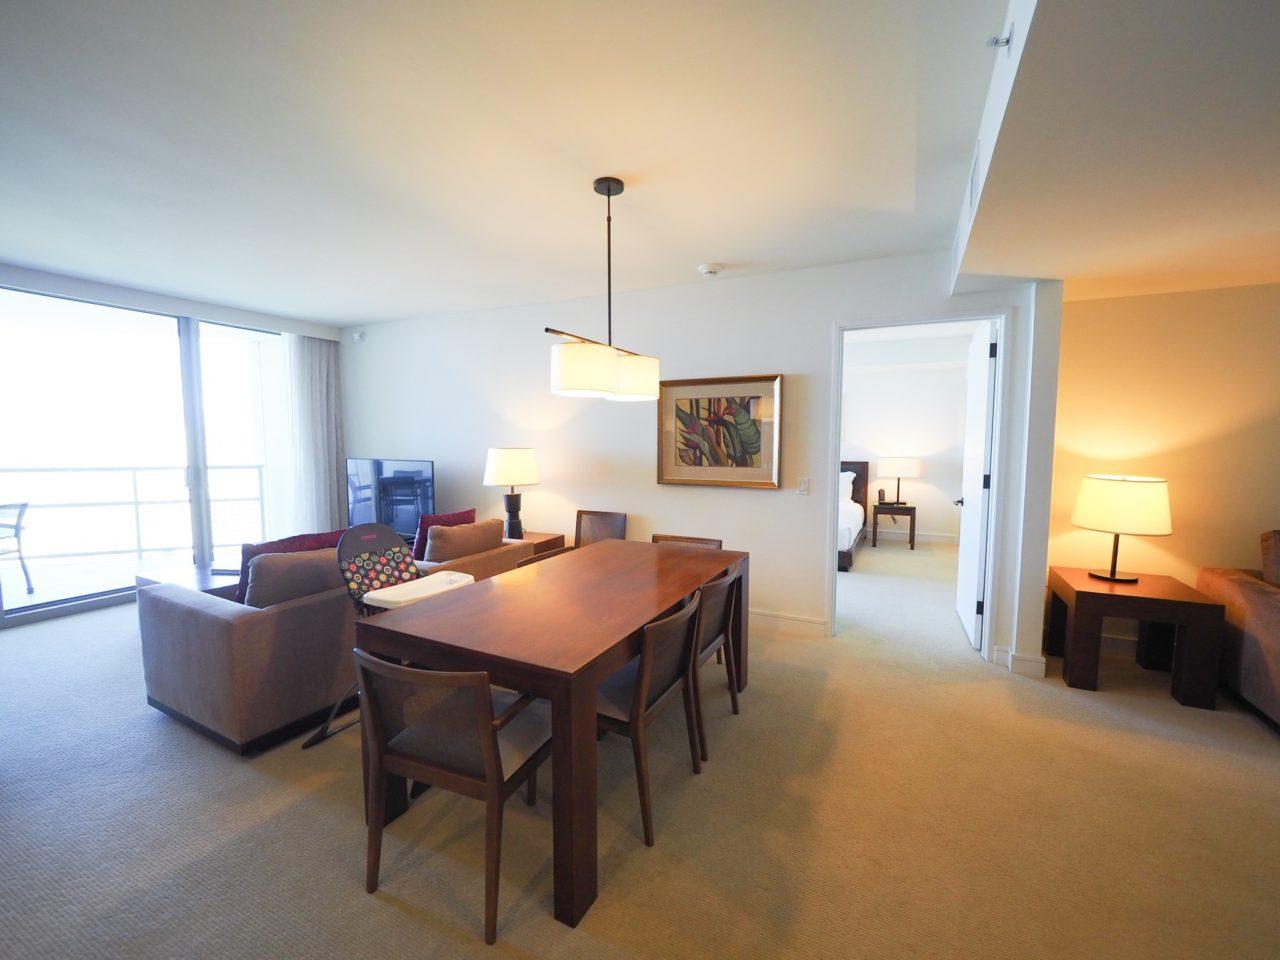 img 4873 - Trump International Hotel Waikiki - ファミリーステイに大満足!トランプ インターナショナル ホテルステイ